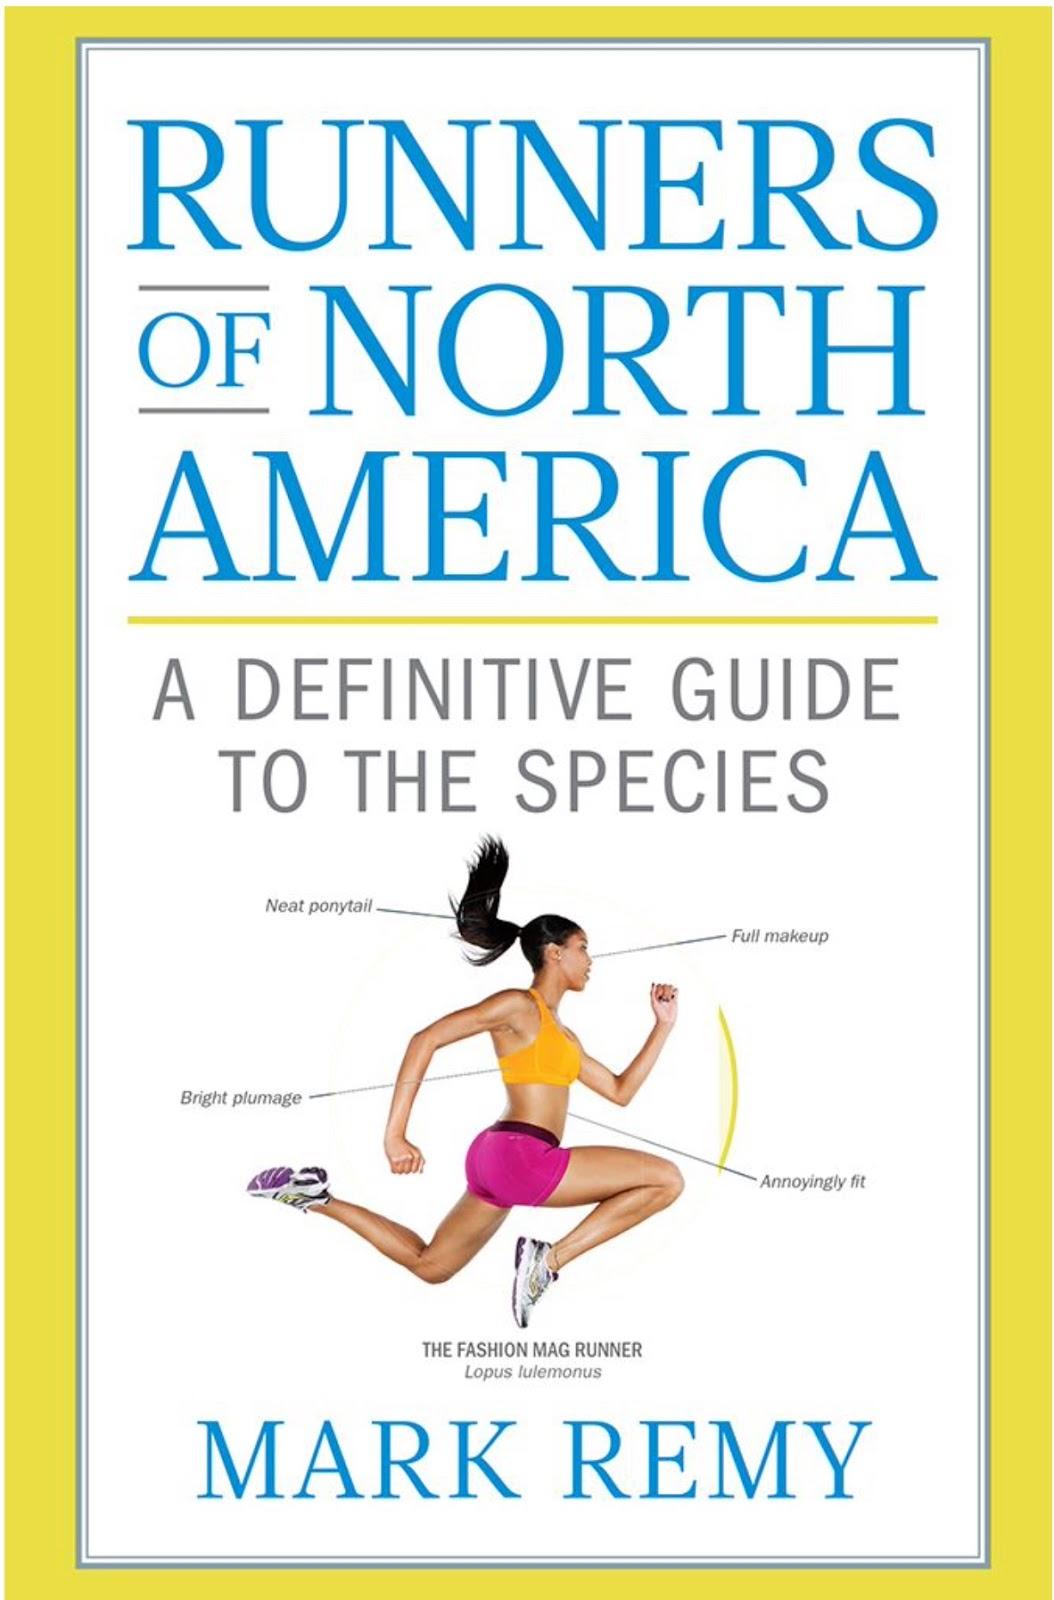 Runners of North America.jpg